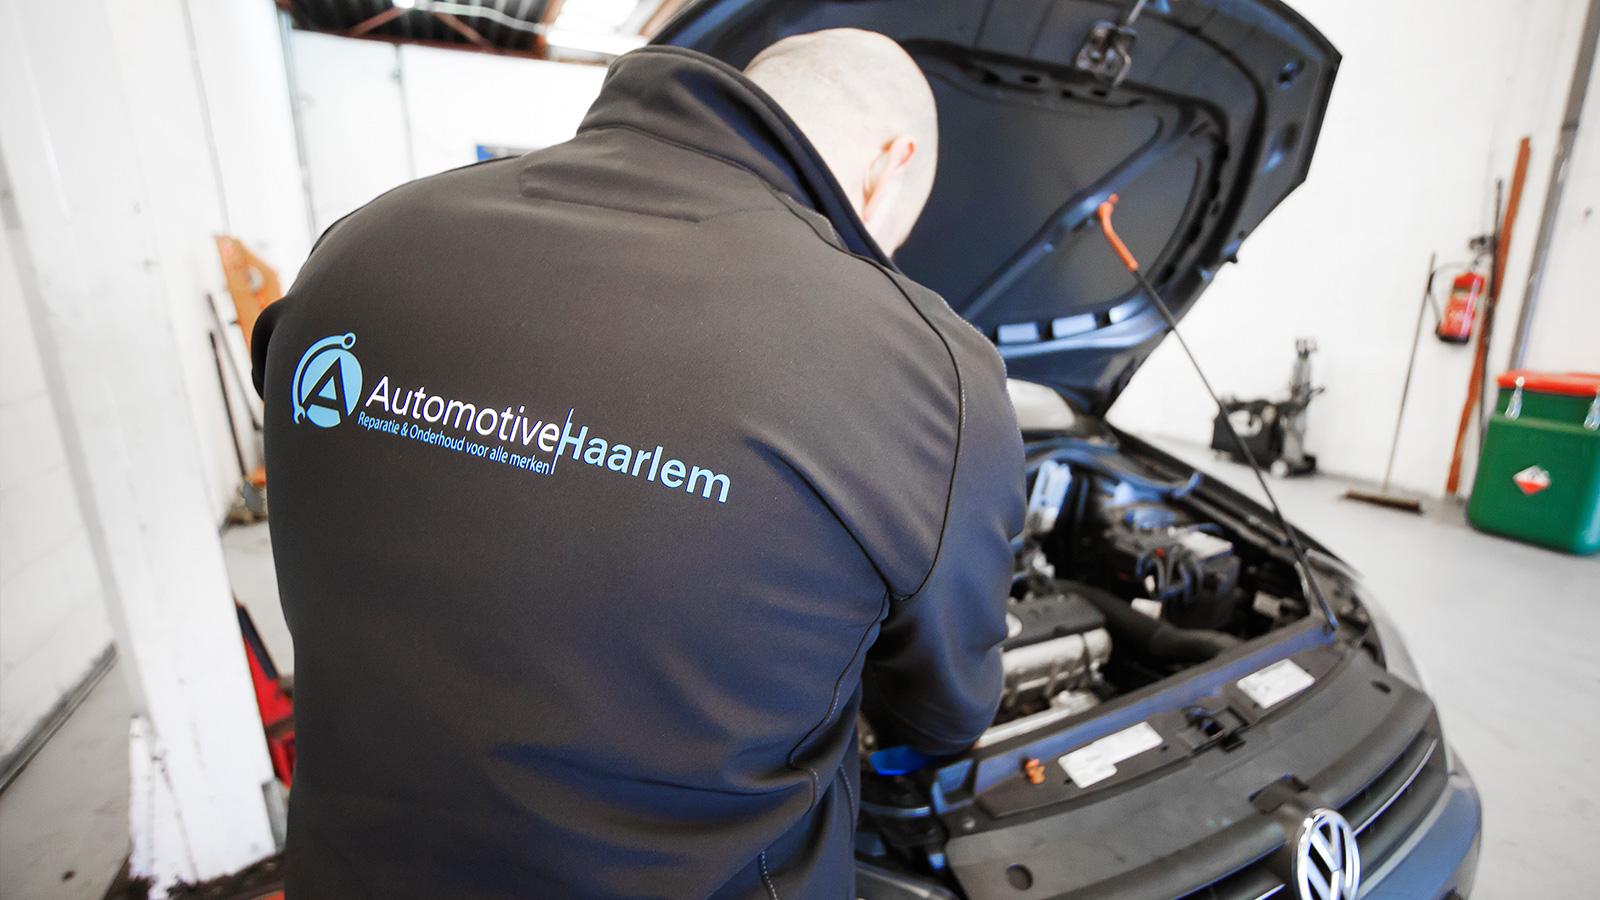 autobanden-wisselen-bij-automotive-haarlem-wintercheck-en-zomercheck